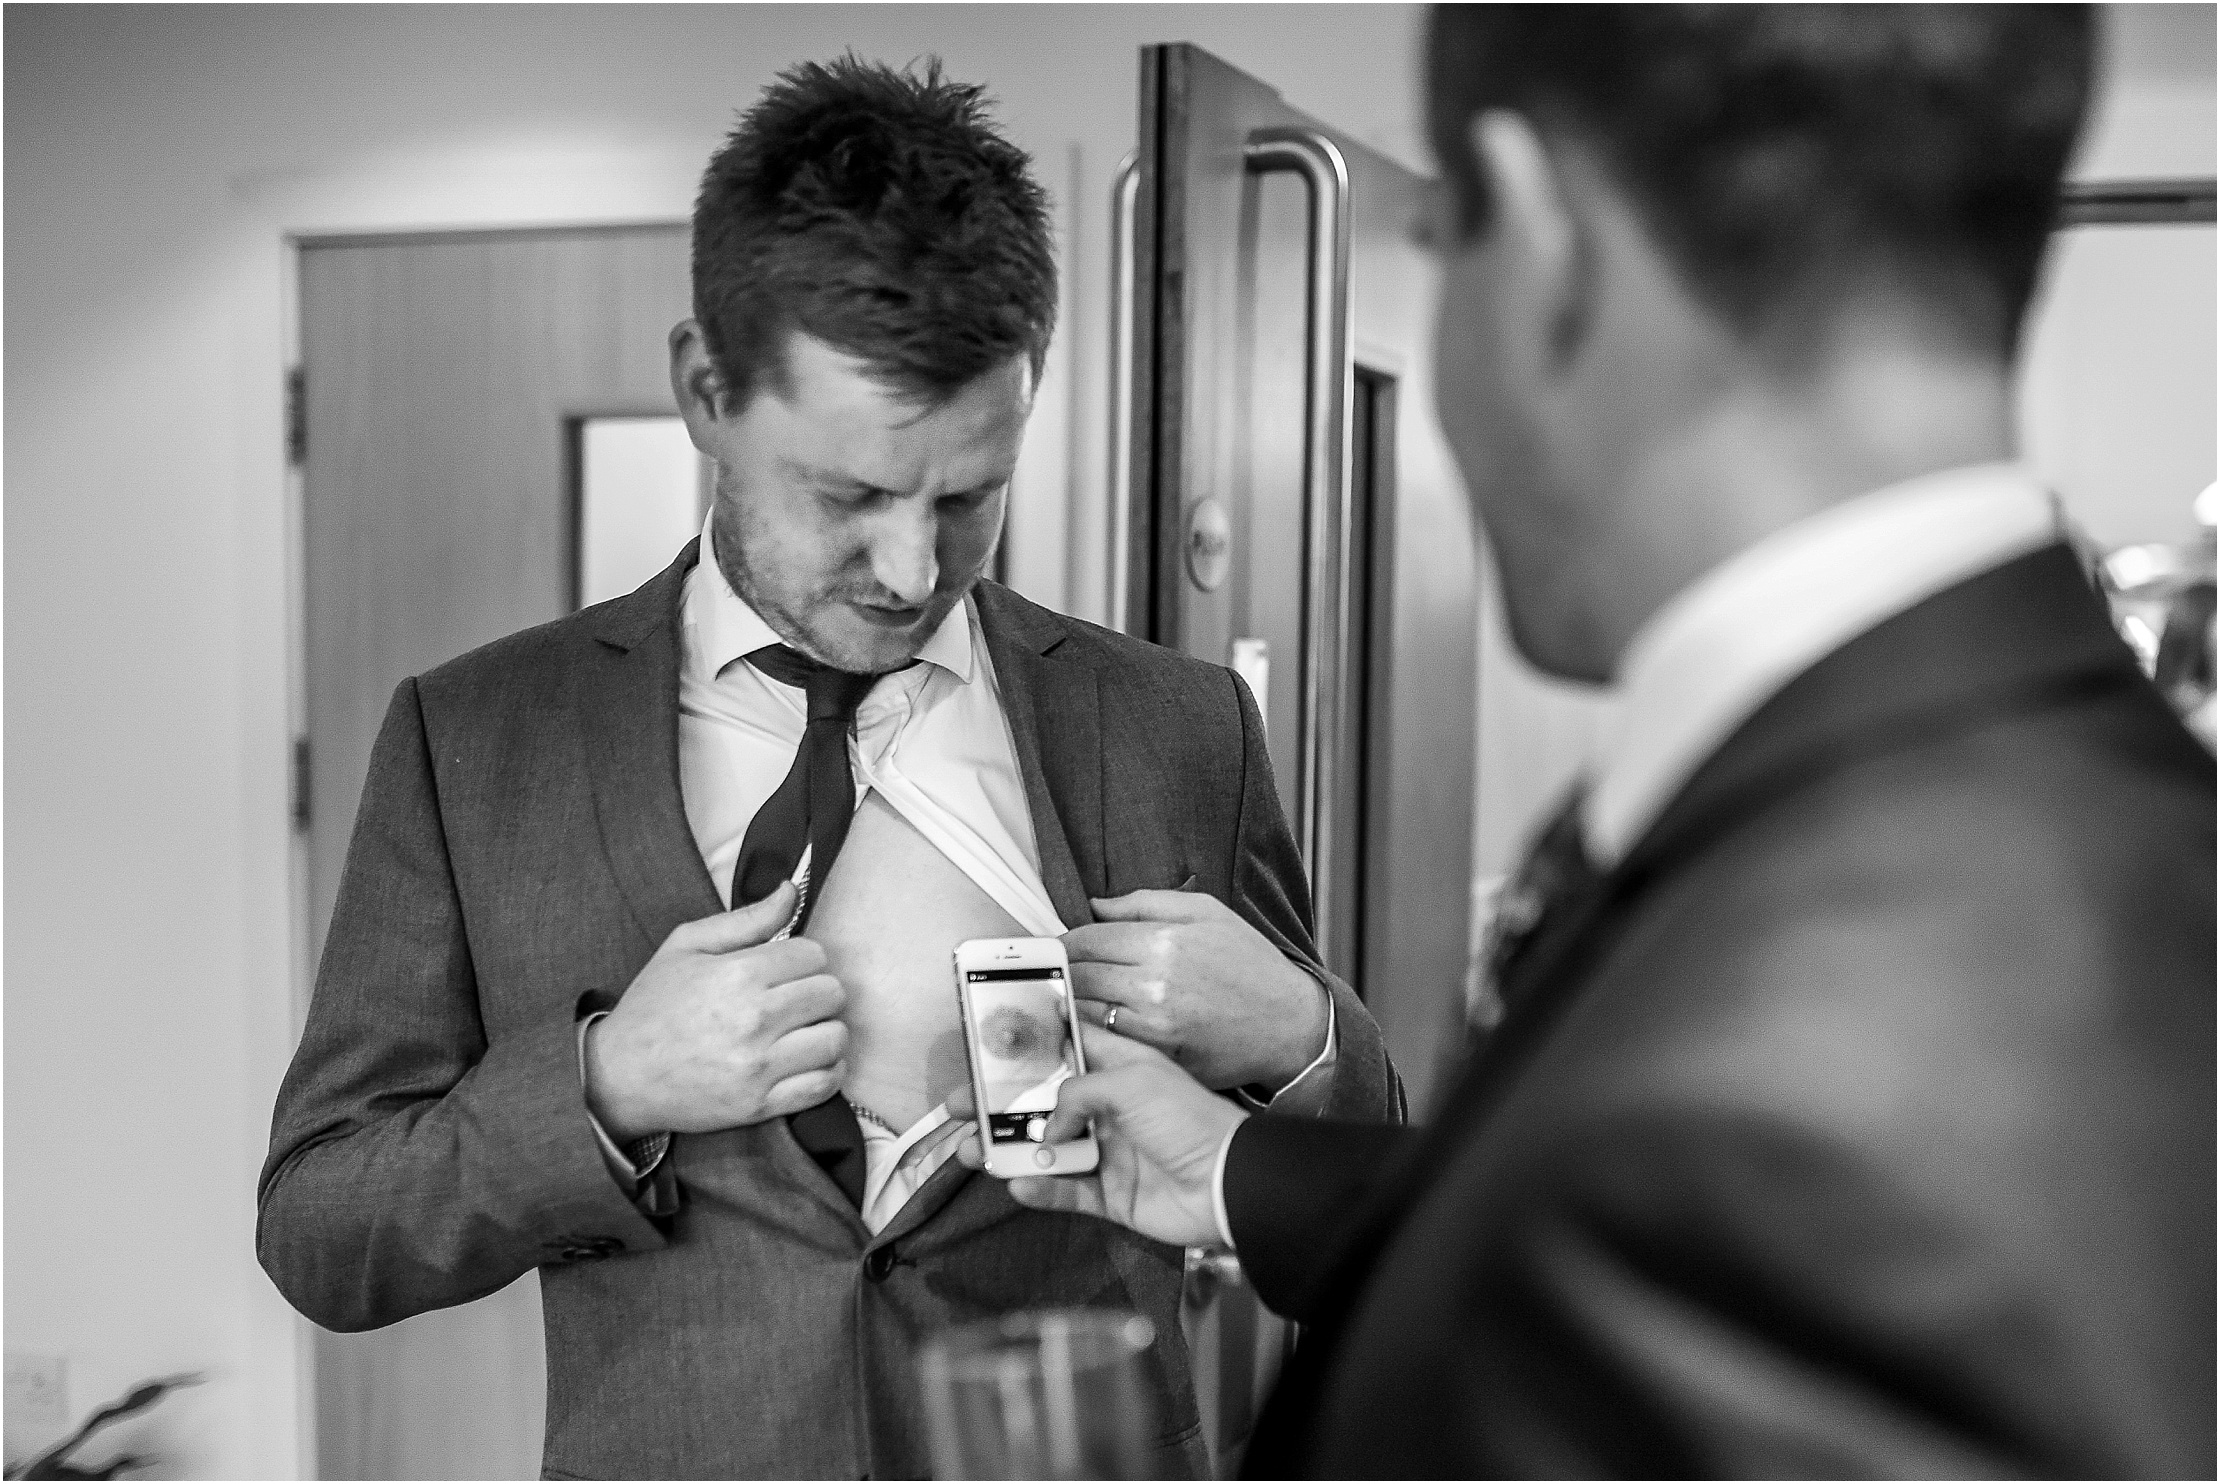 staining-lodge-wedding-113.jpg